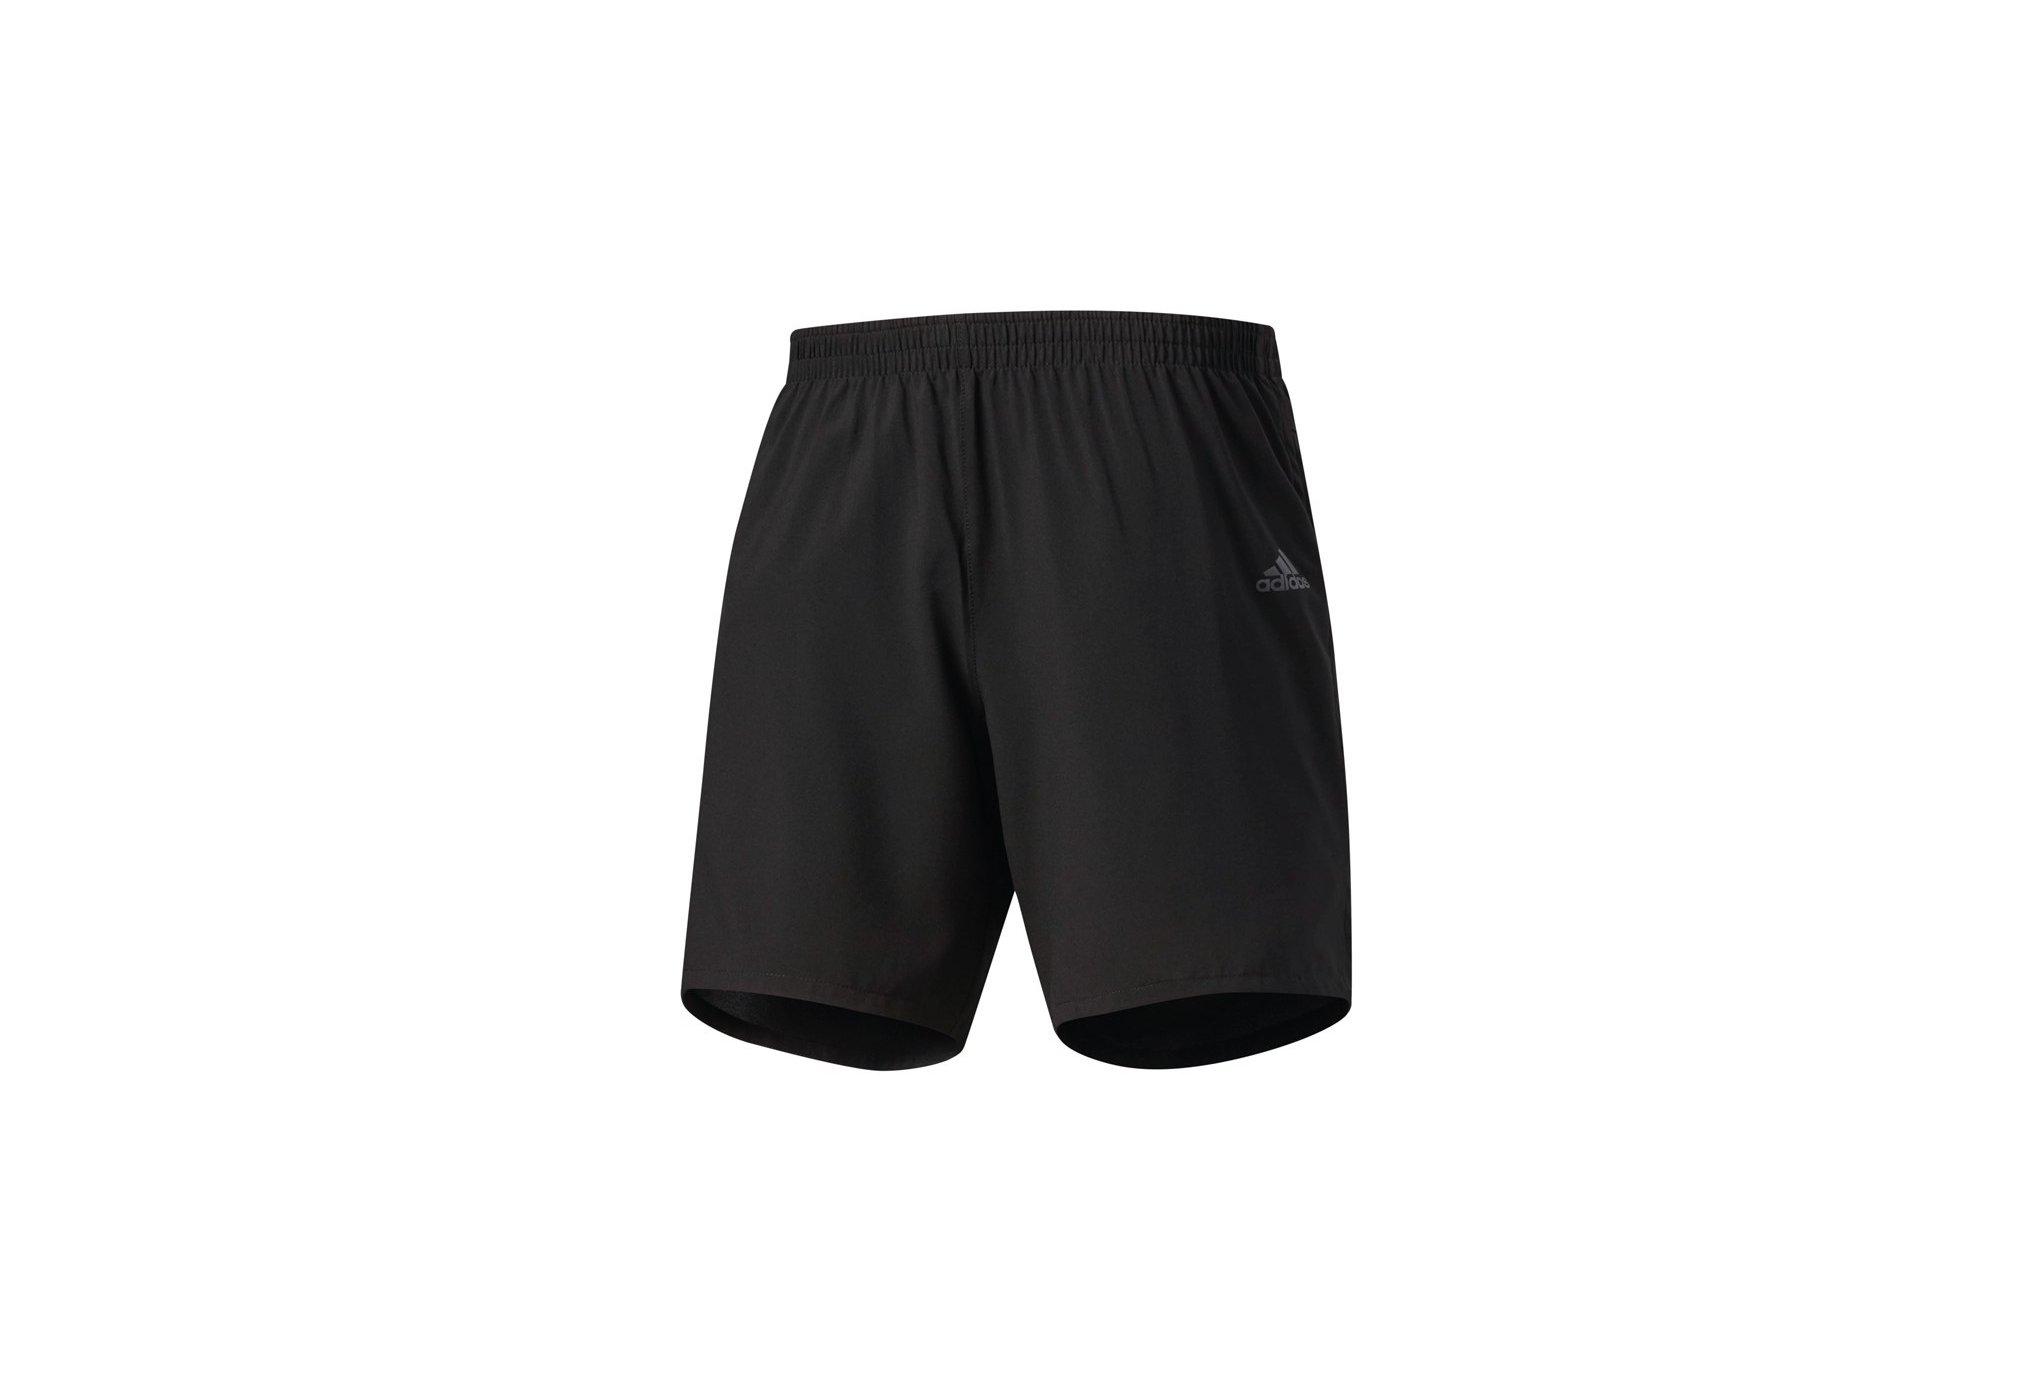 Adidas Response 5 inch m vêtement running homme